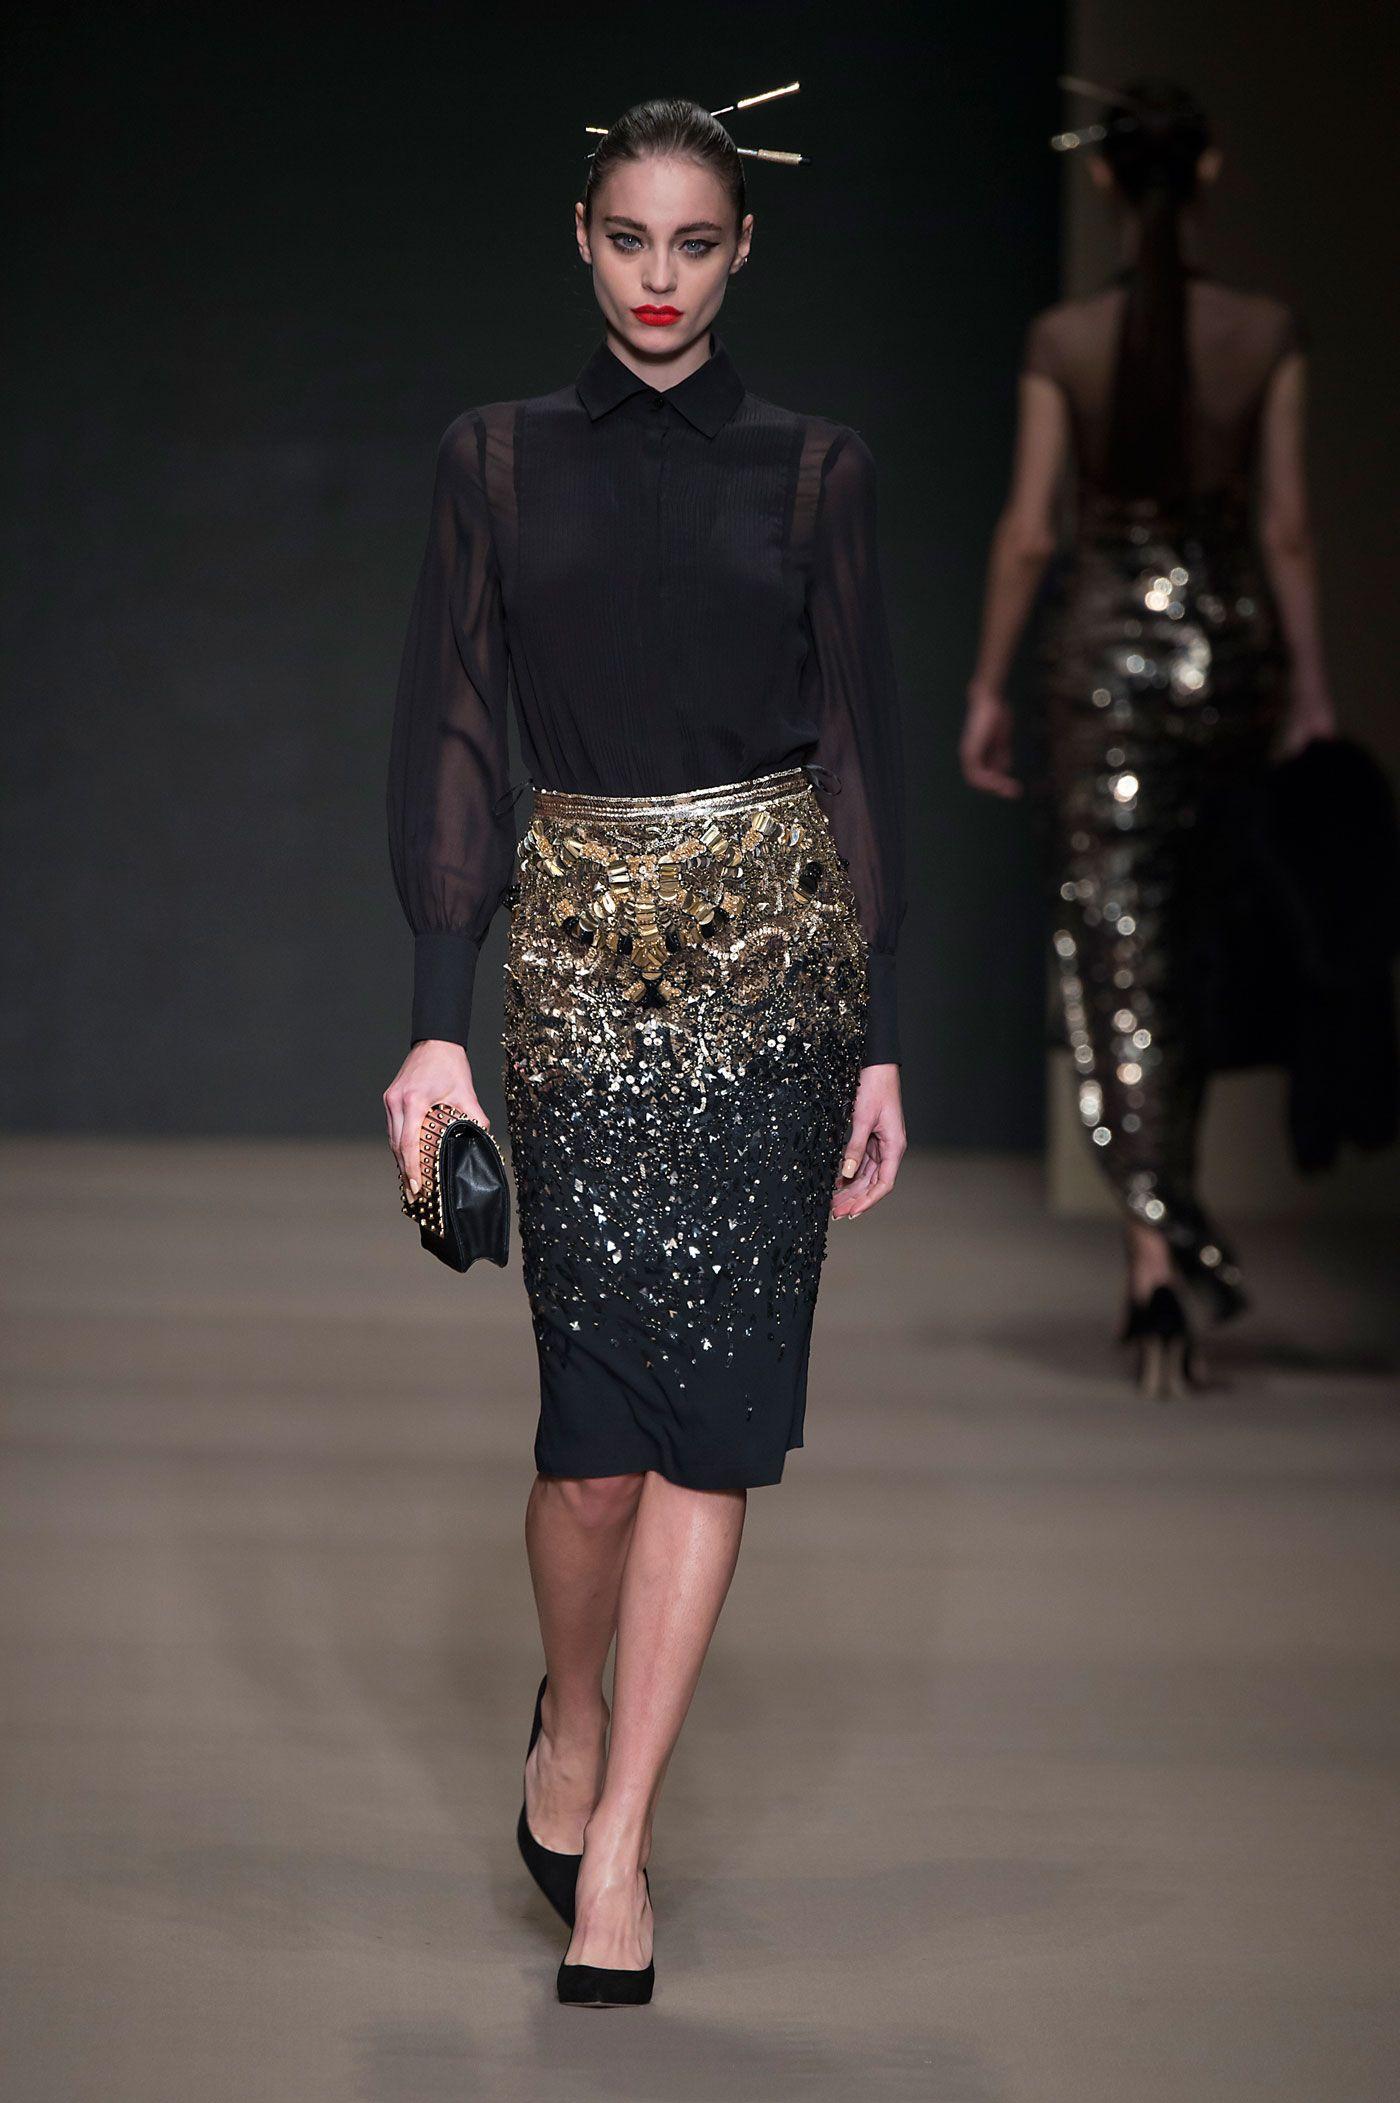 http://www.elisabettafranchi.it/index.php/gallery/look-49-fashion-show-fw-15/